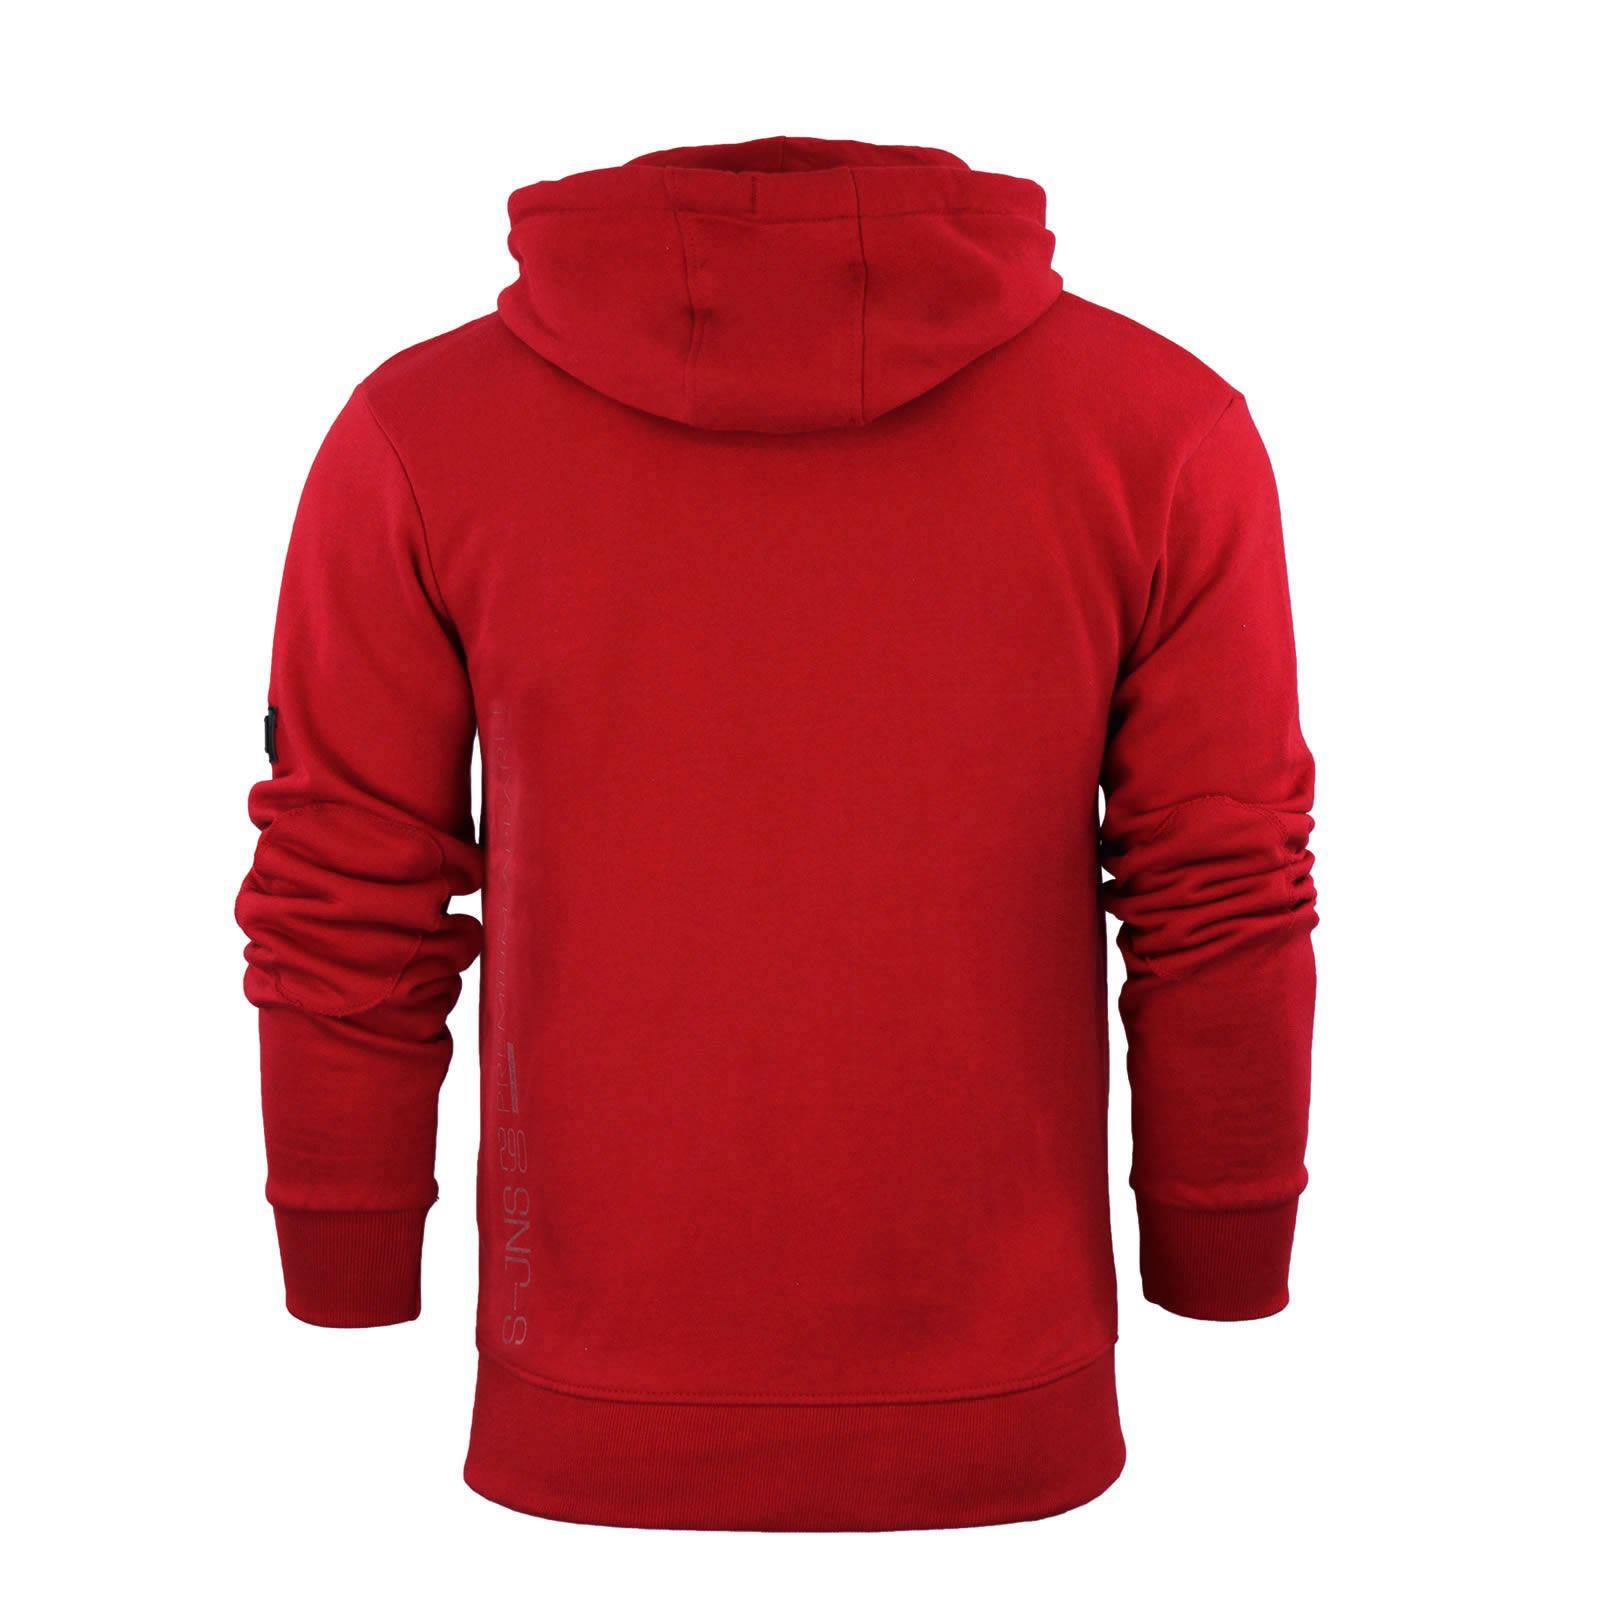 Mens-Hoodie-Smith-amp-Jones-Zip-Up-Hooded-Sweater-Jumper thumbnail 9